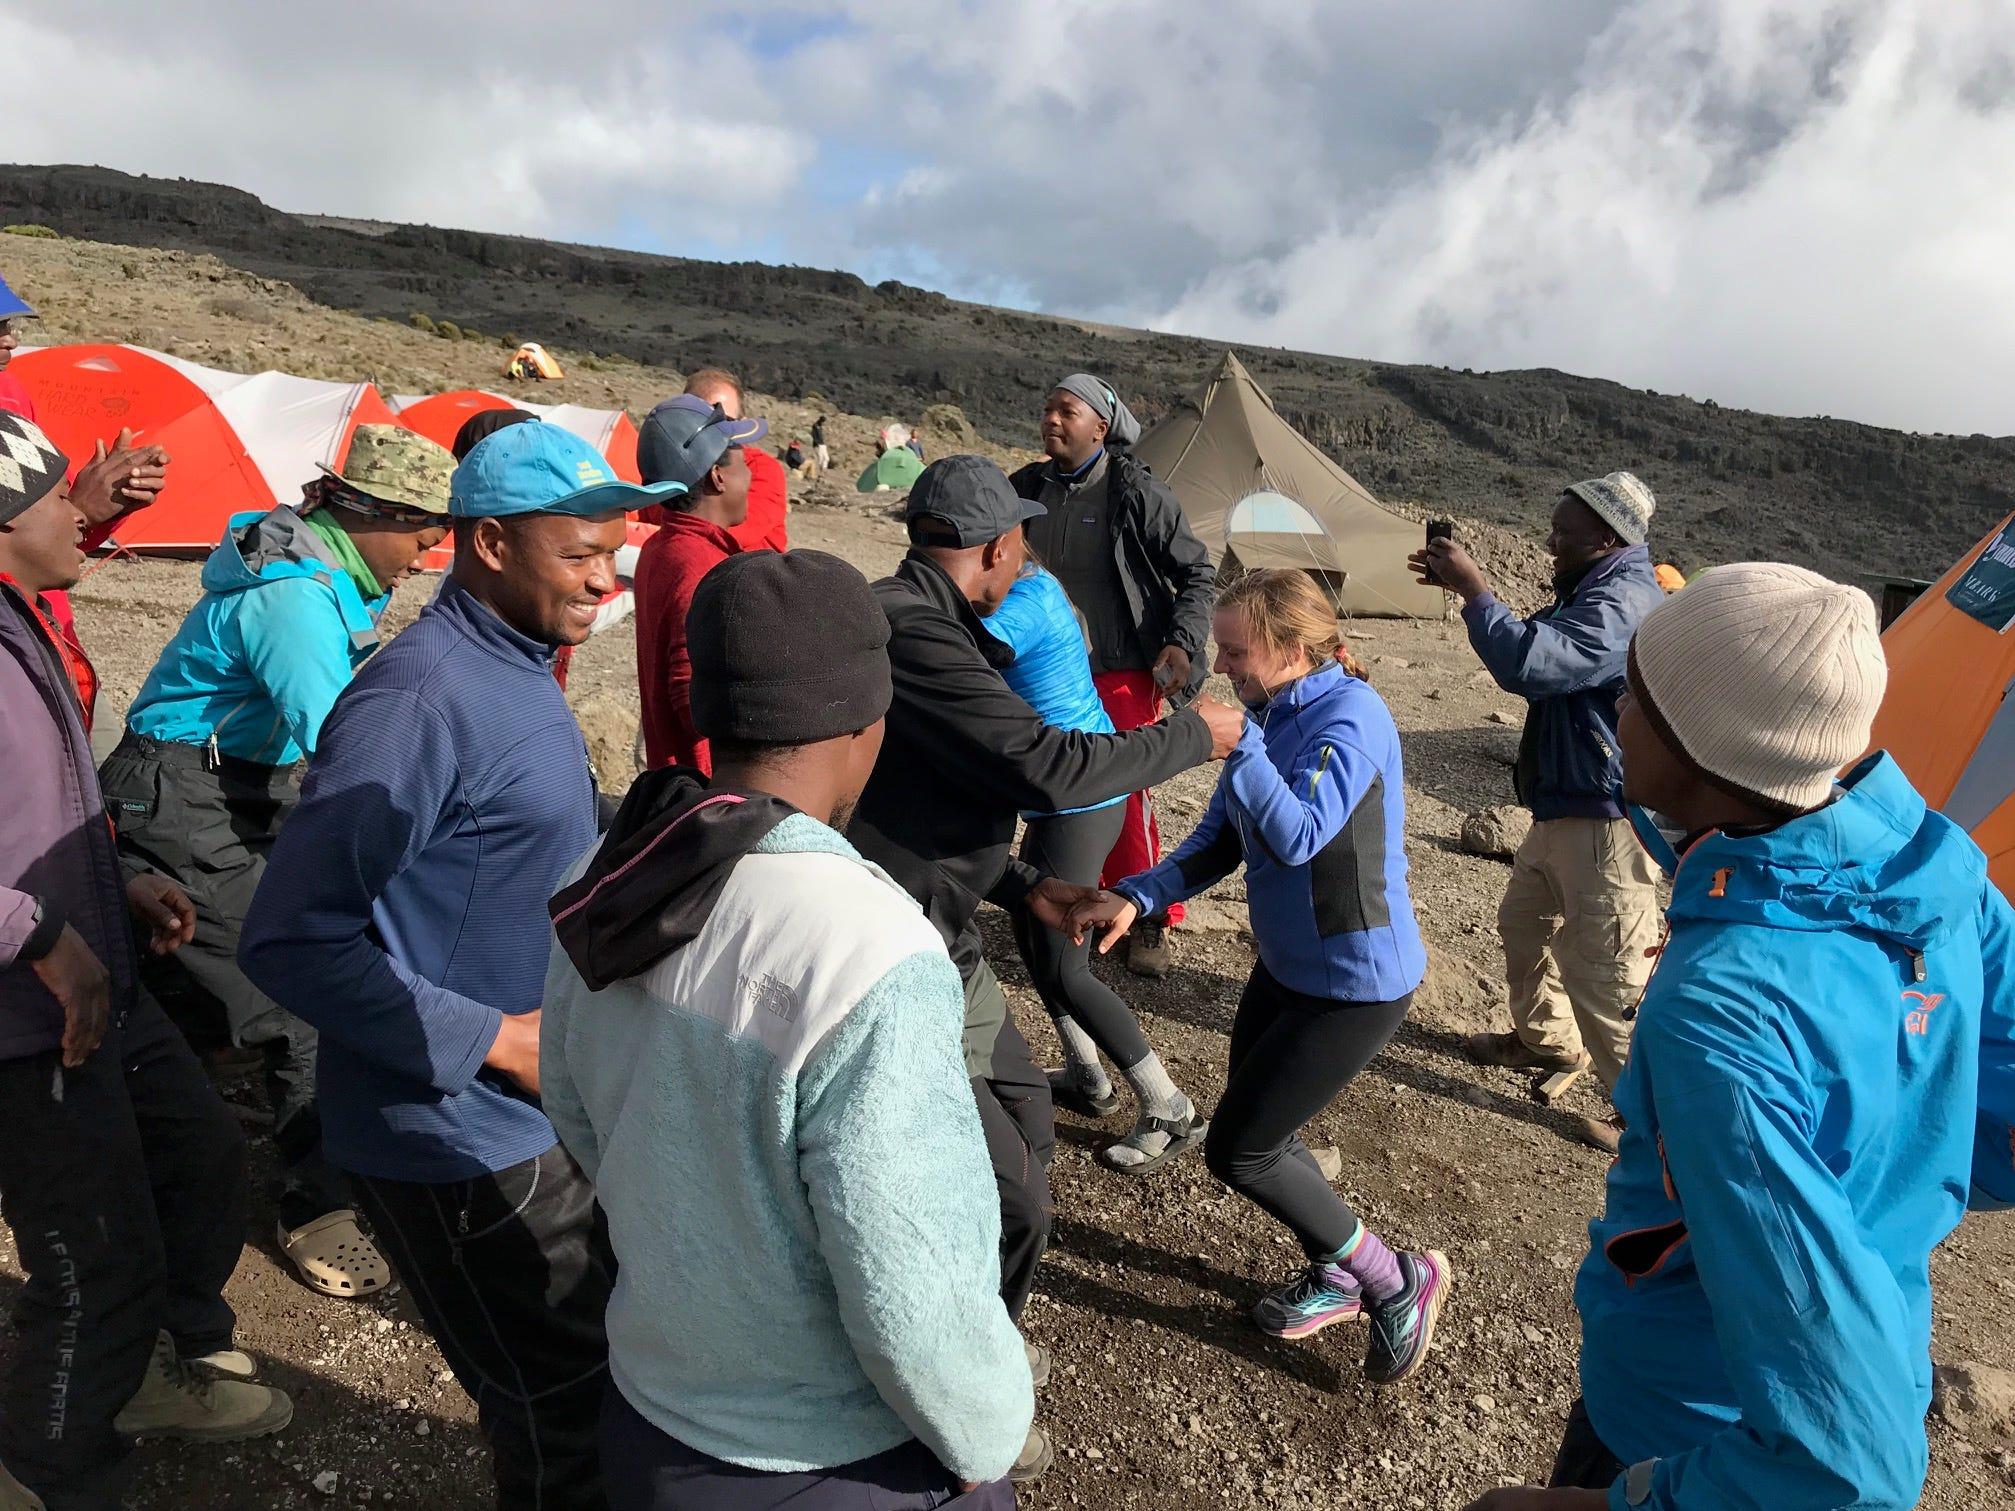 Jordan Grantz dancing wth porters on Mount Kilimanjaro, Tanzania